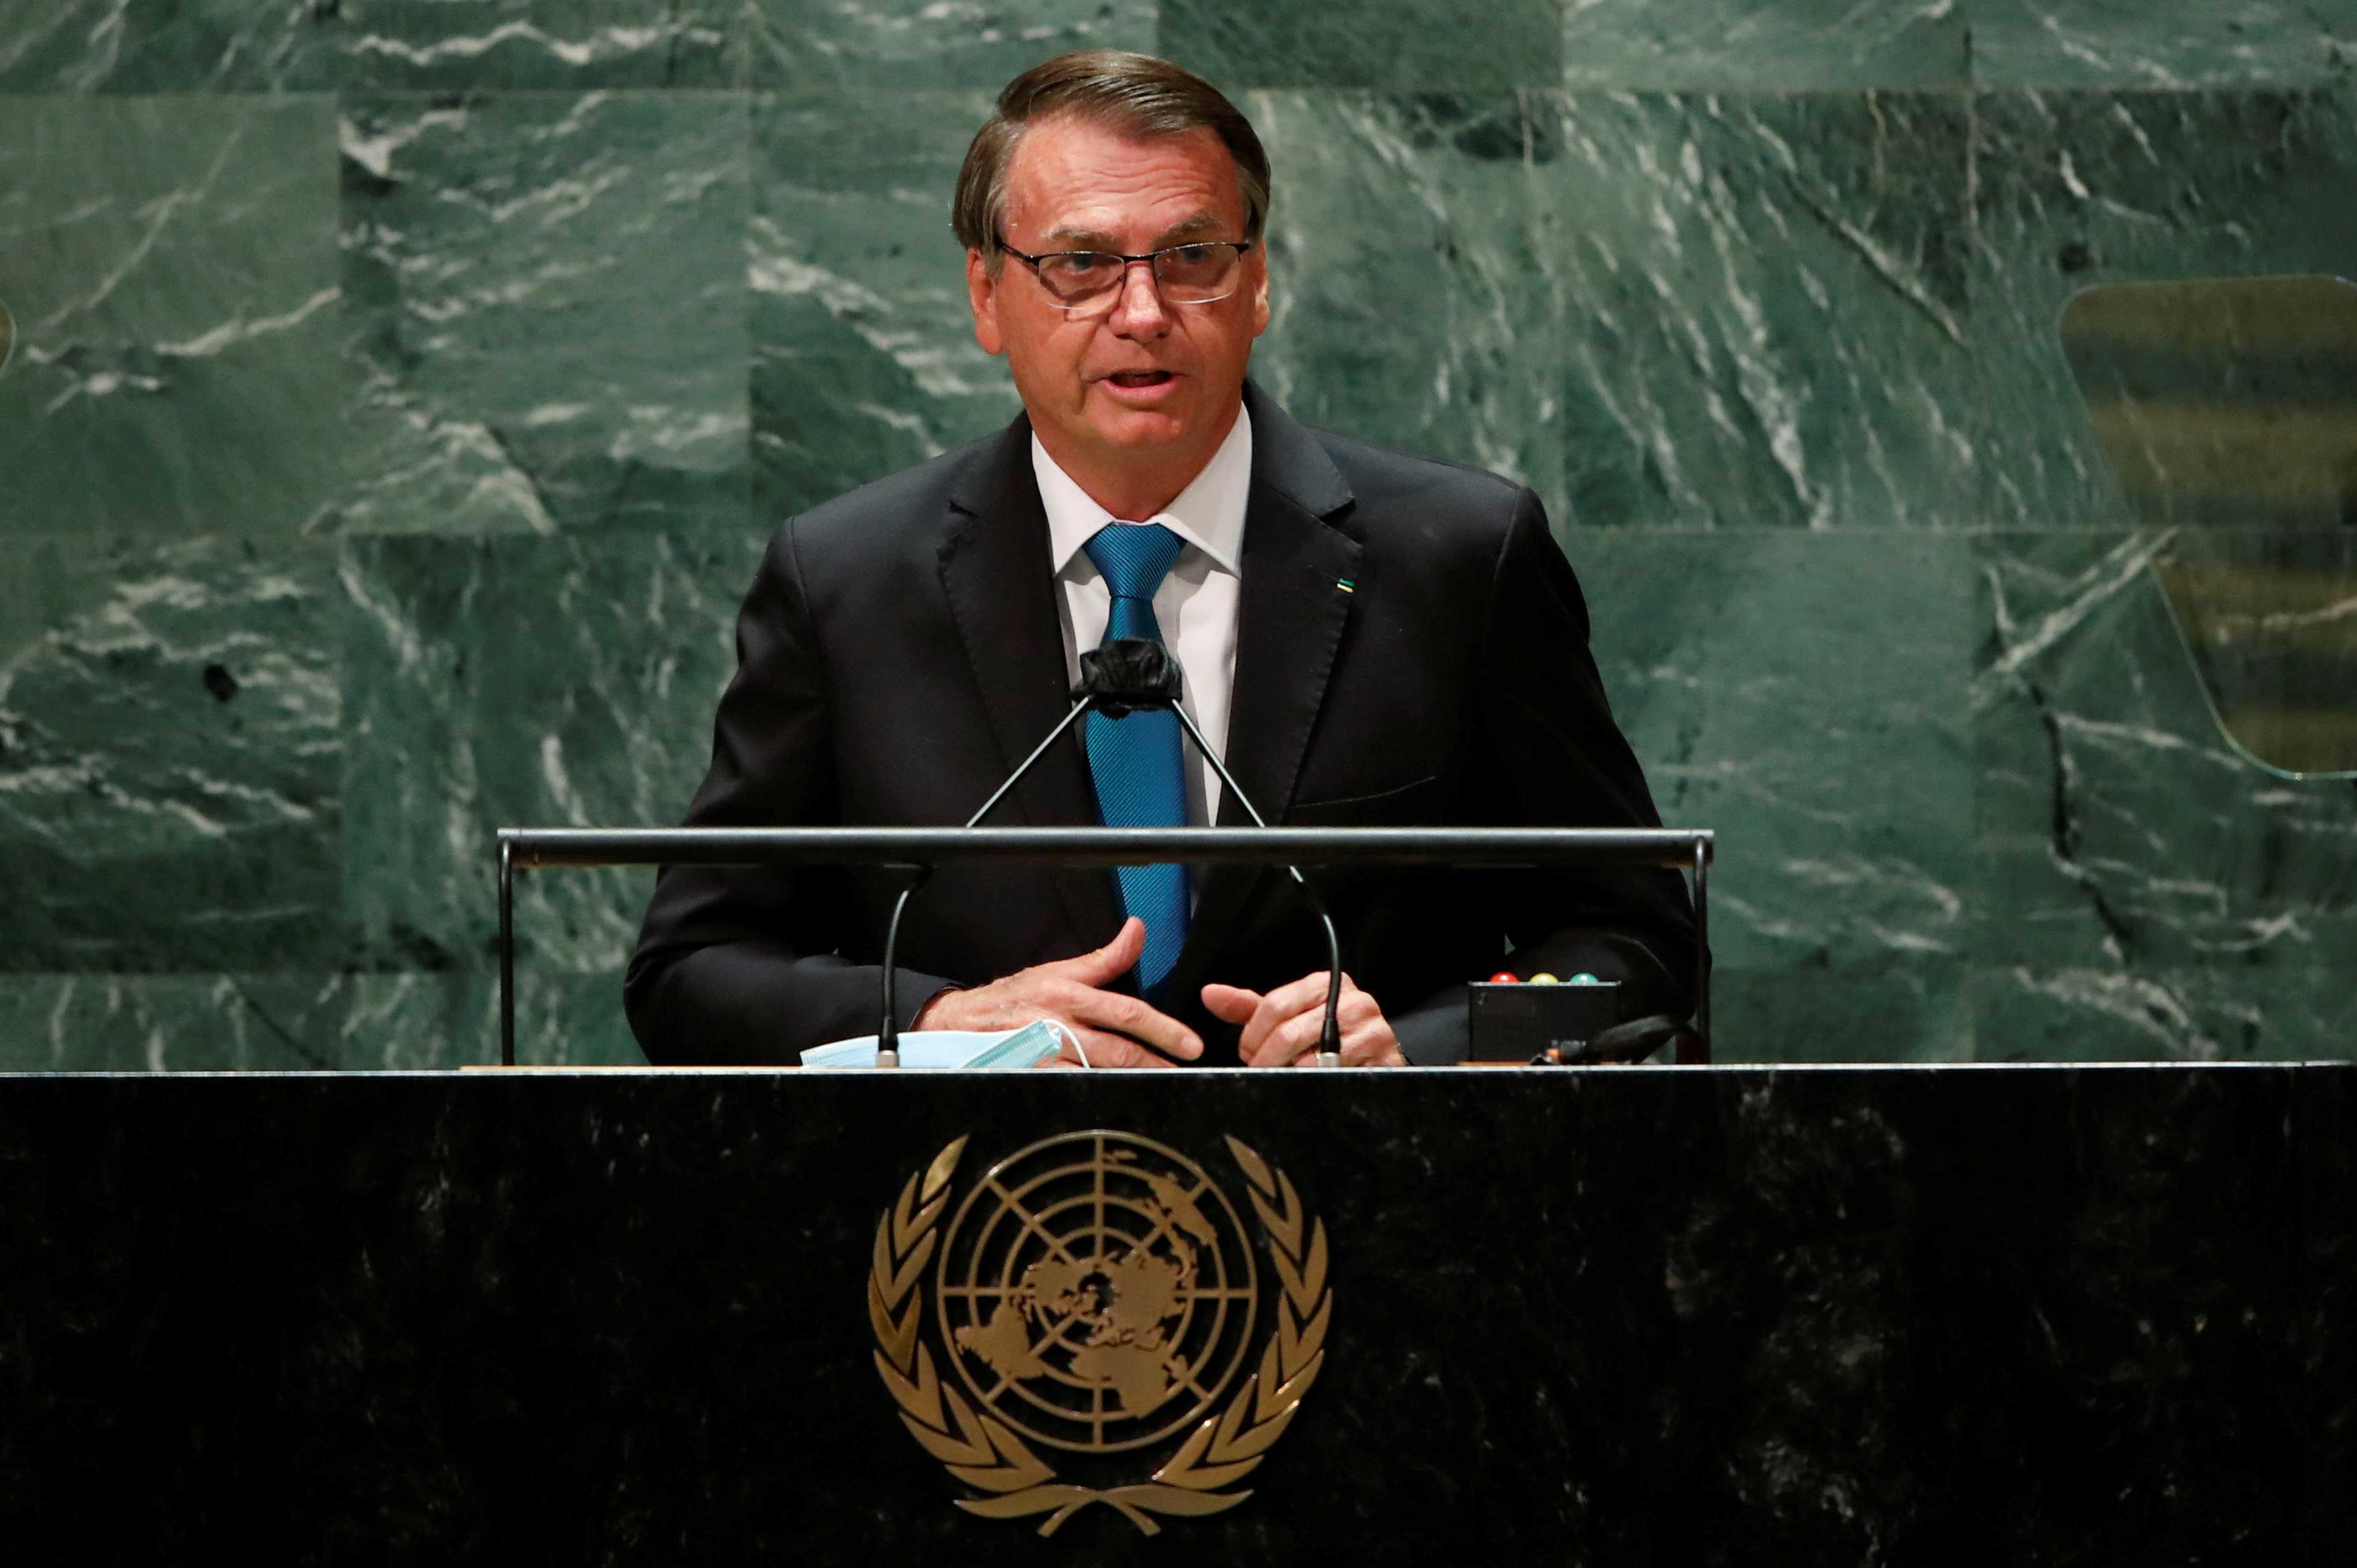 Brazil's President Jair Bolsonaro addresses the 76th Session of the U.N. General Assembly in New York City, U.S., September 21, 2021.  REUTERS/Eduardo Munoz/Pool